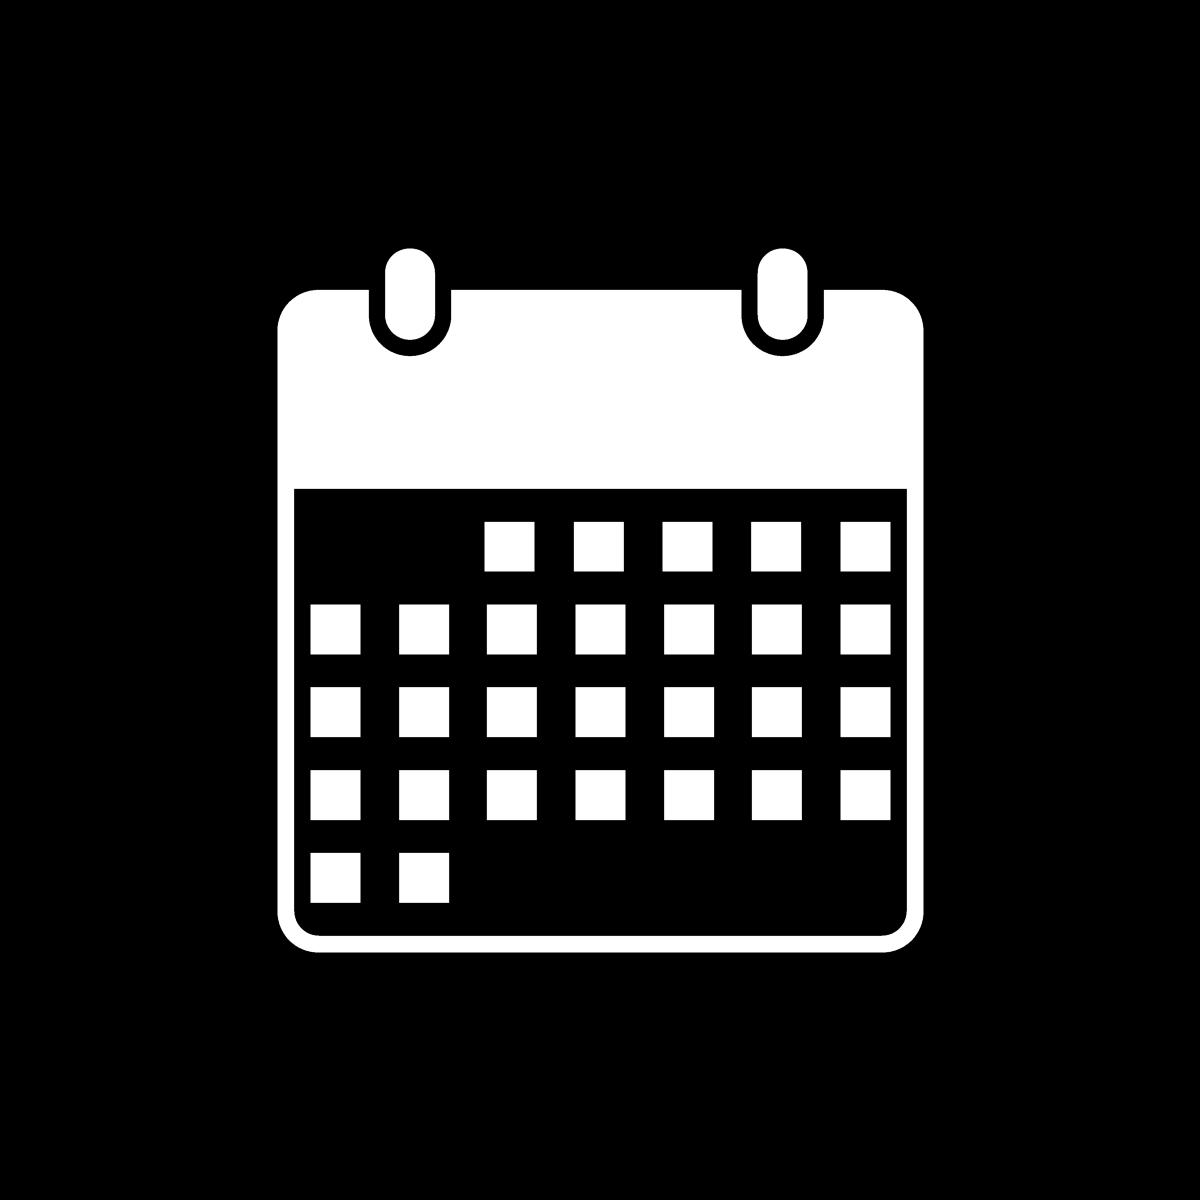 image of estate inspection calendar